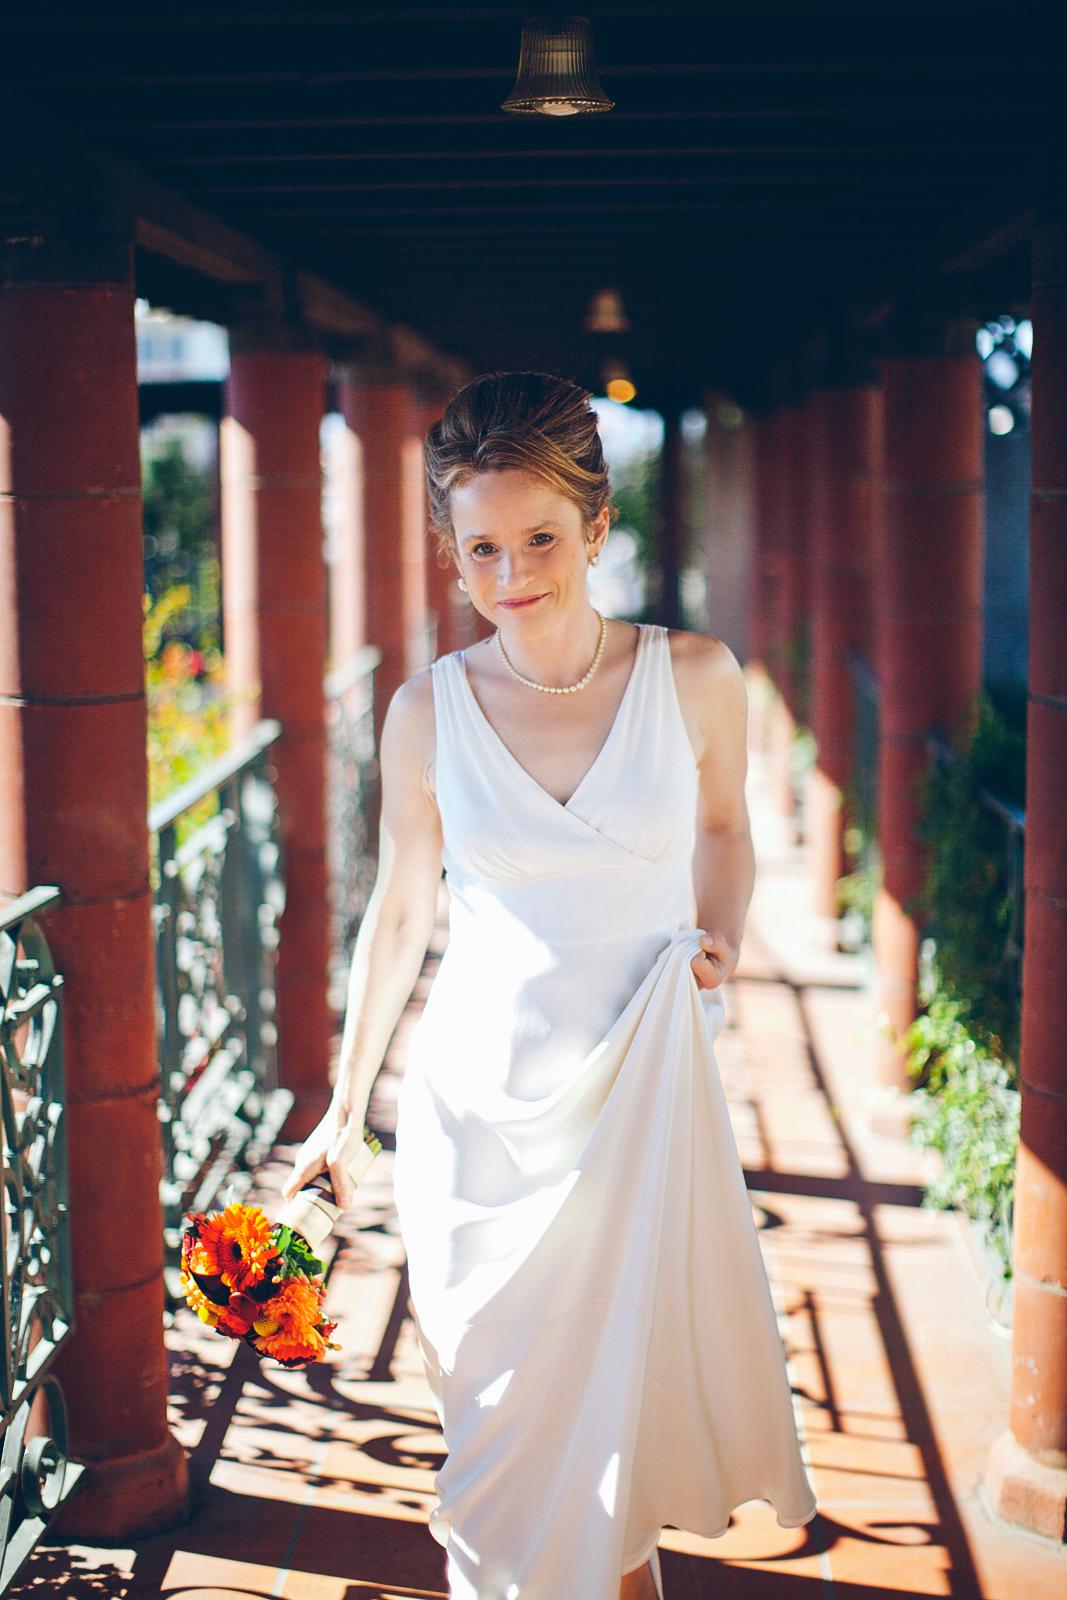 Riverside_ca_wedding_photography_marguerite_carolyn_ebony_siovhan_bokeh_photography_14.jpg